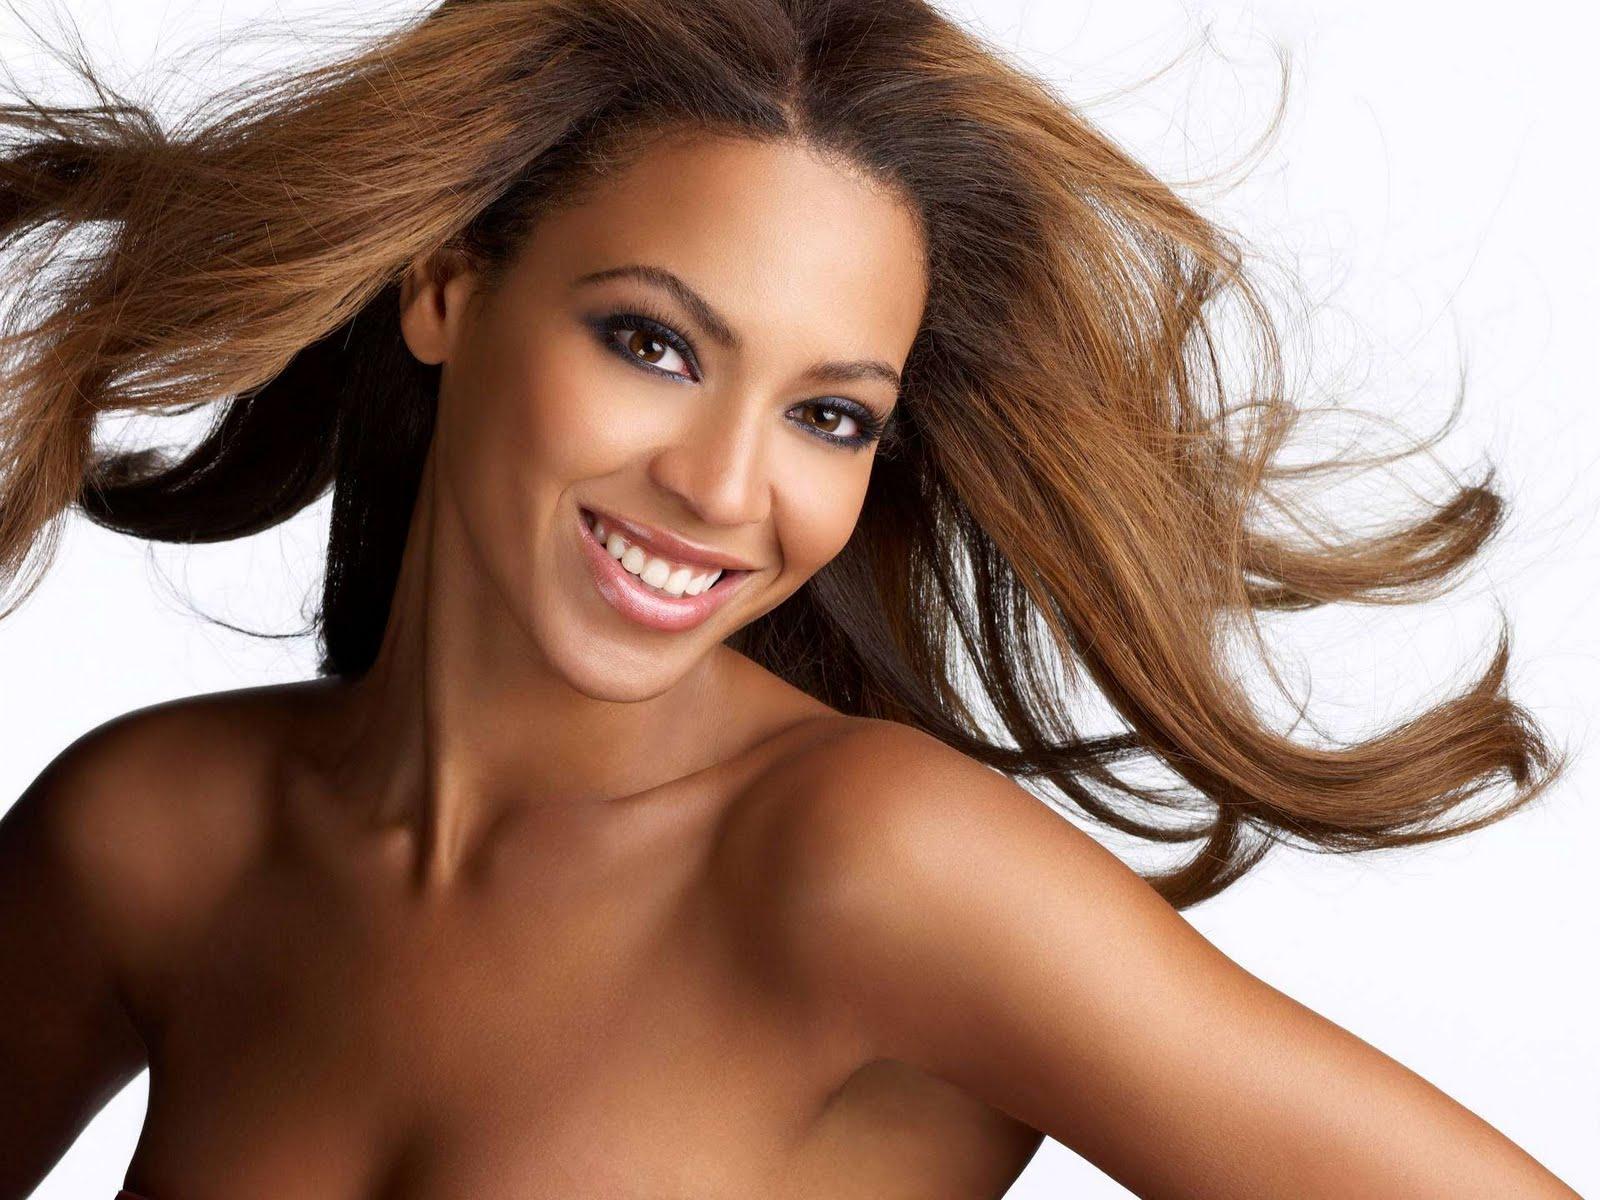 http://3.bp.blogspot.com/-GIG4Sj8riao/TiRe5XNfYQI/AAAAAAAAIL0/_TgLigrLP00/s1600/Beyonce+-Knowles+-13.jpg